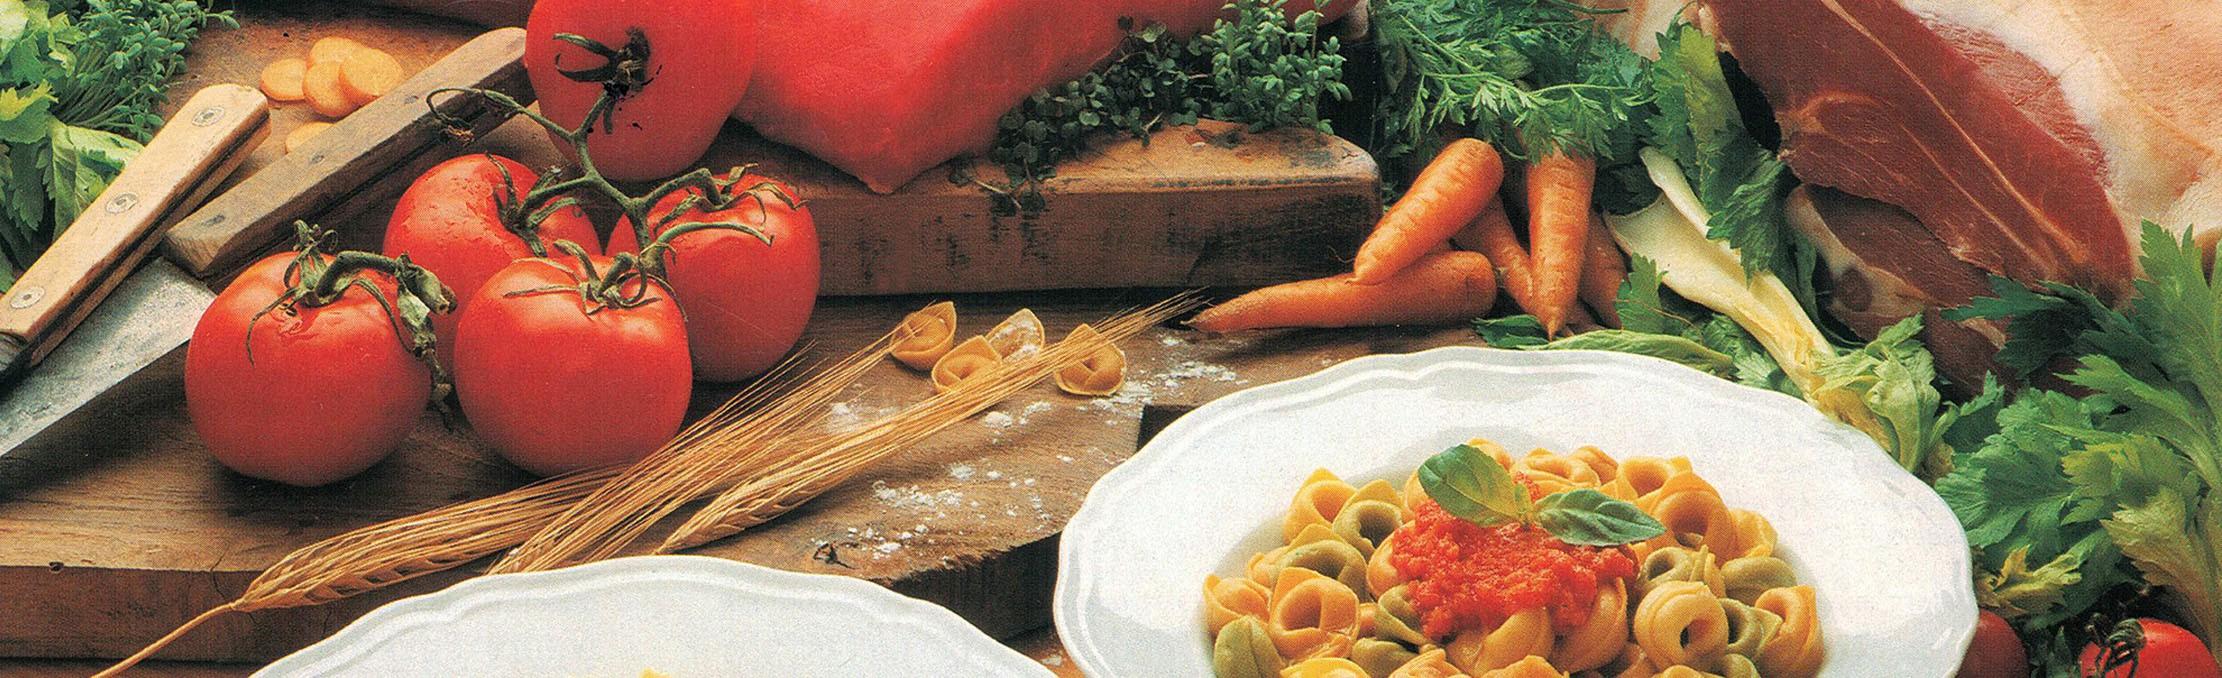 Pagani Industrie Alimentari S.p.A.